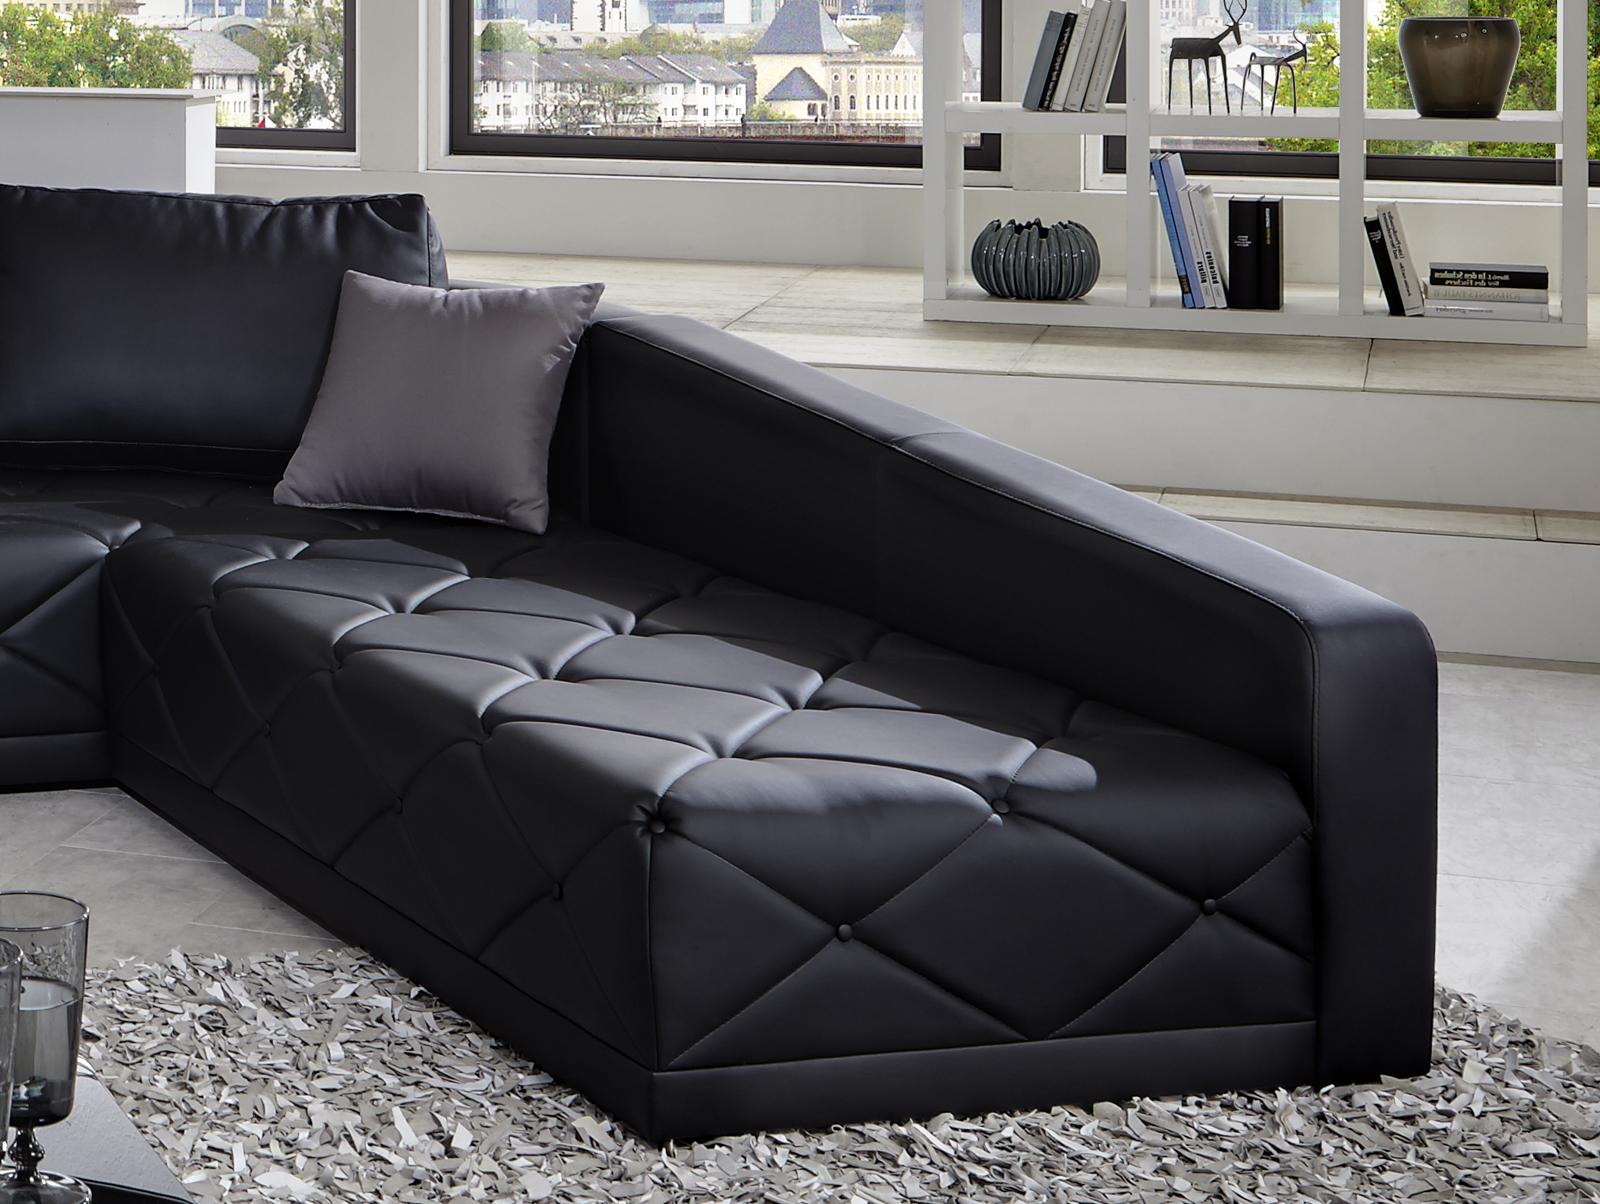 sam design sofa schwarz nero wohnlandschaft 380 x 290 cm. Black Bedroom Furniture Sets. Home Design Ideas